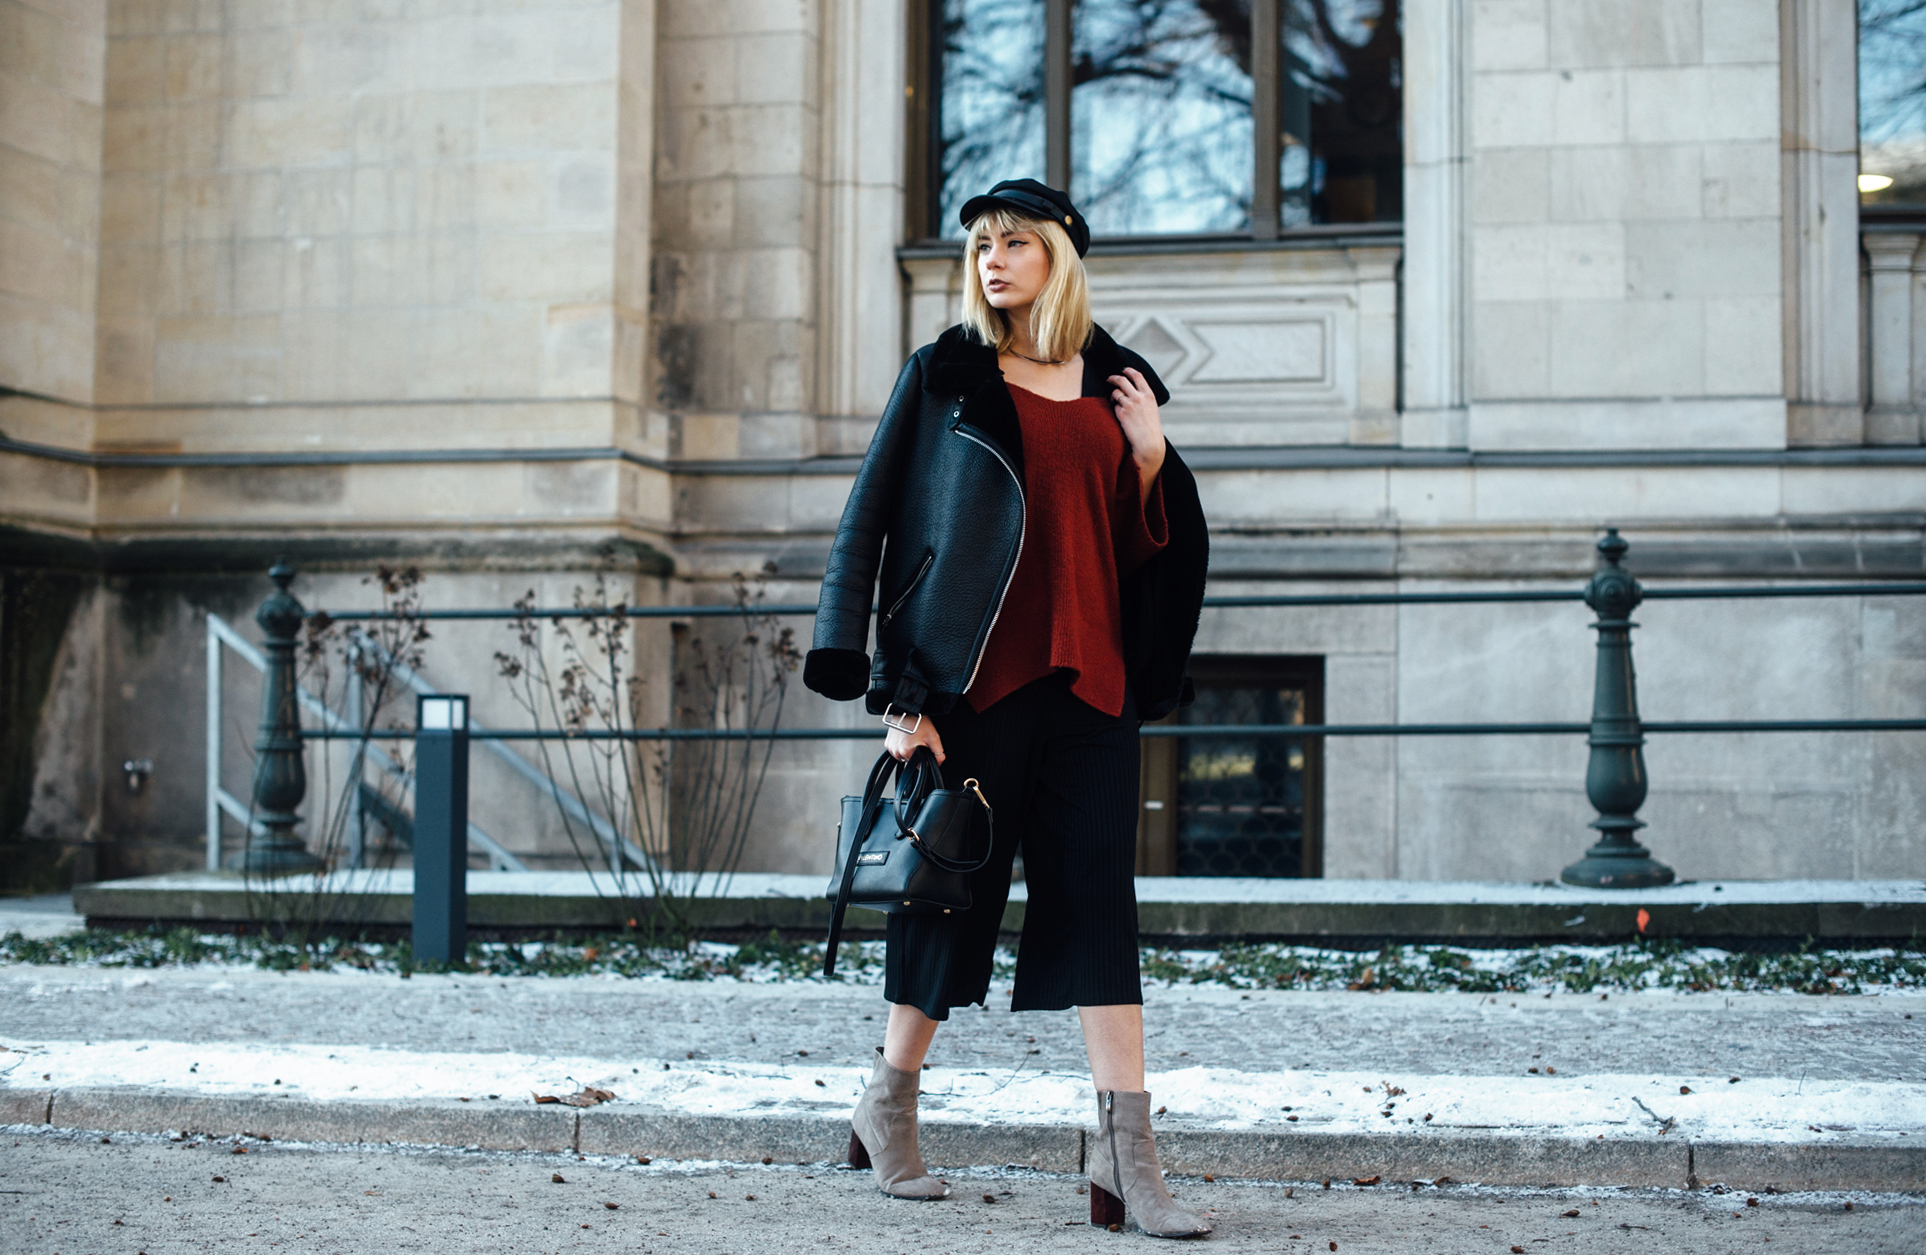 04-Kiamisu-Modeblog-Fashion Week Berlin_Shearling Jacke_Tamaris Stiefeletten_Schiebermütze-3